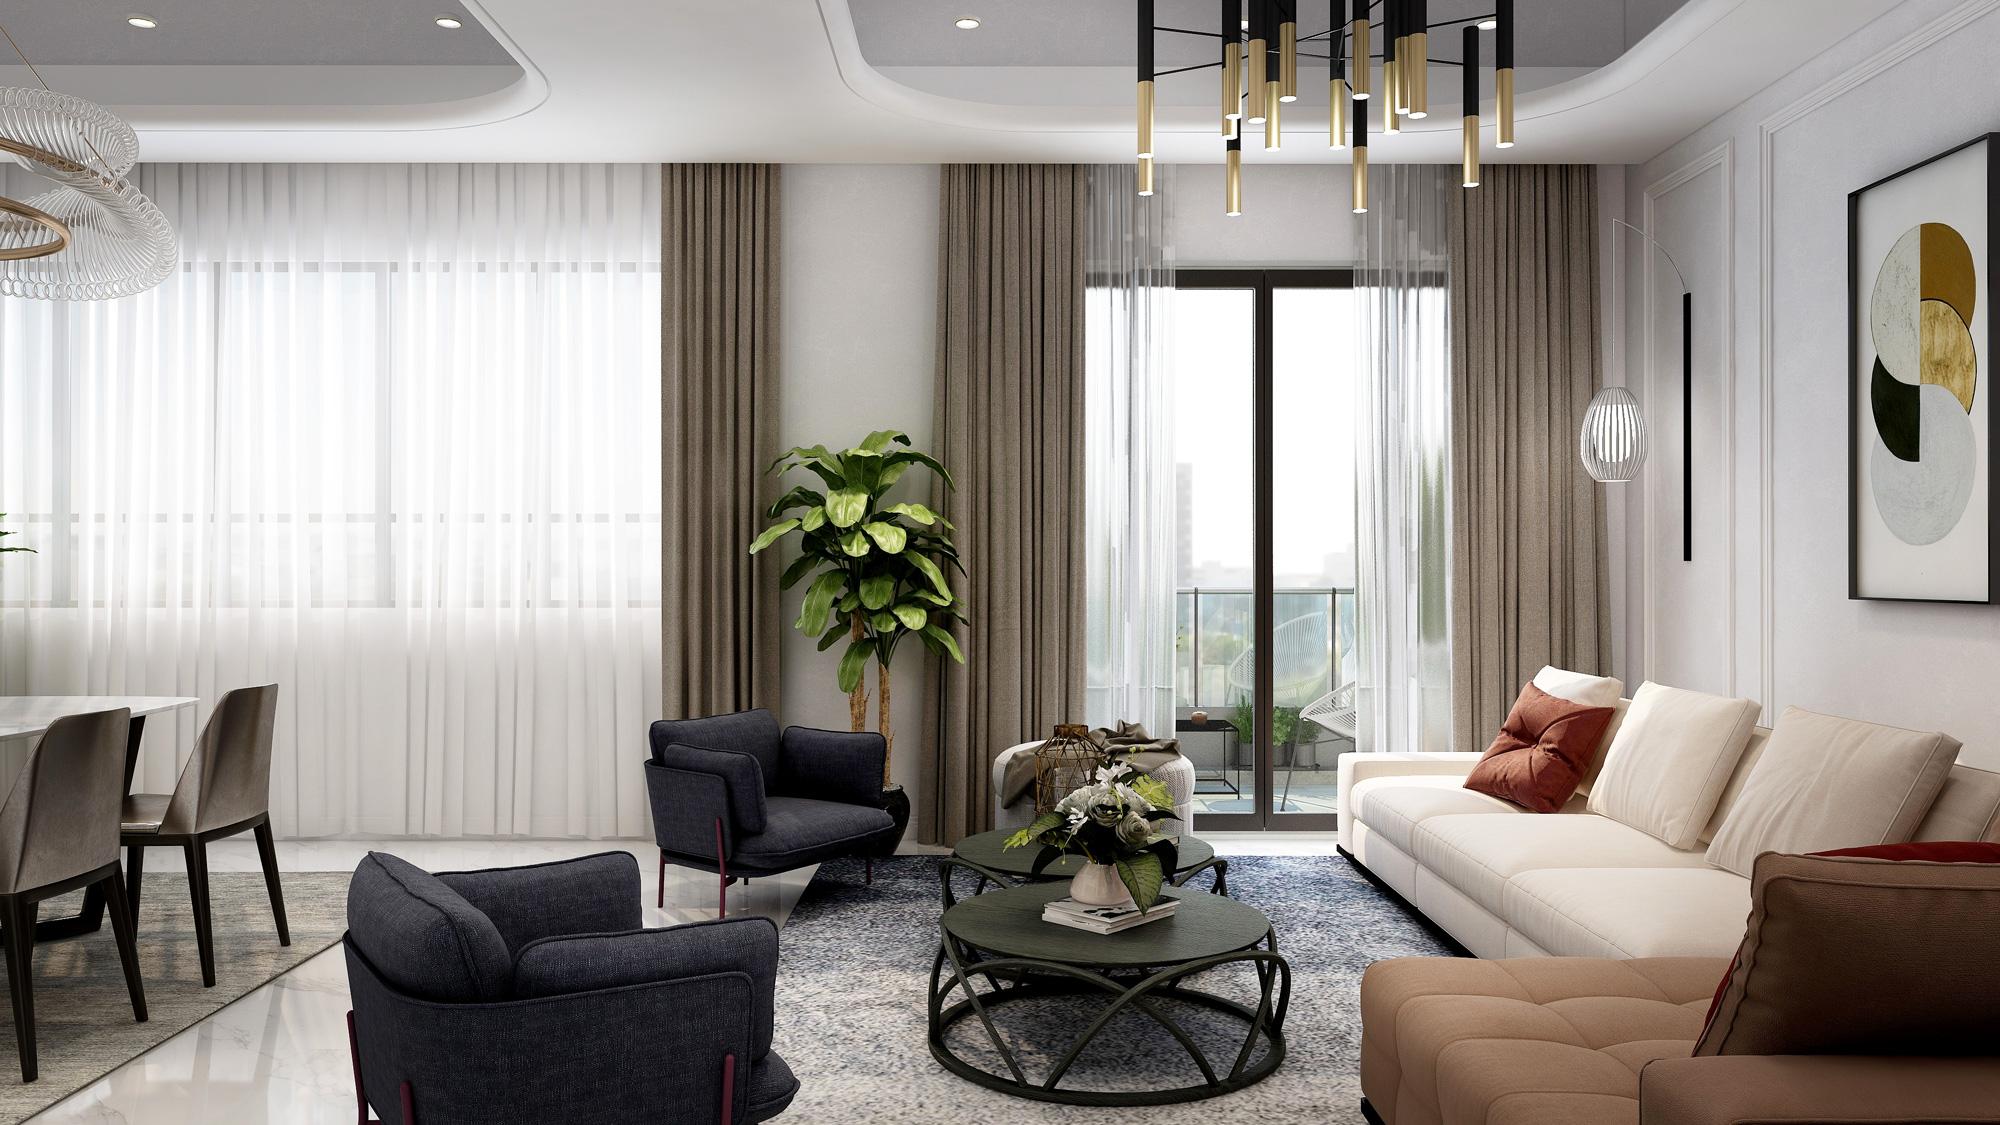 Living Room interior design villa french style Chongqing 法式 客廳 室內設計 重慶 別墅